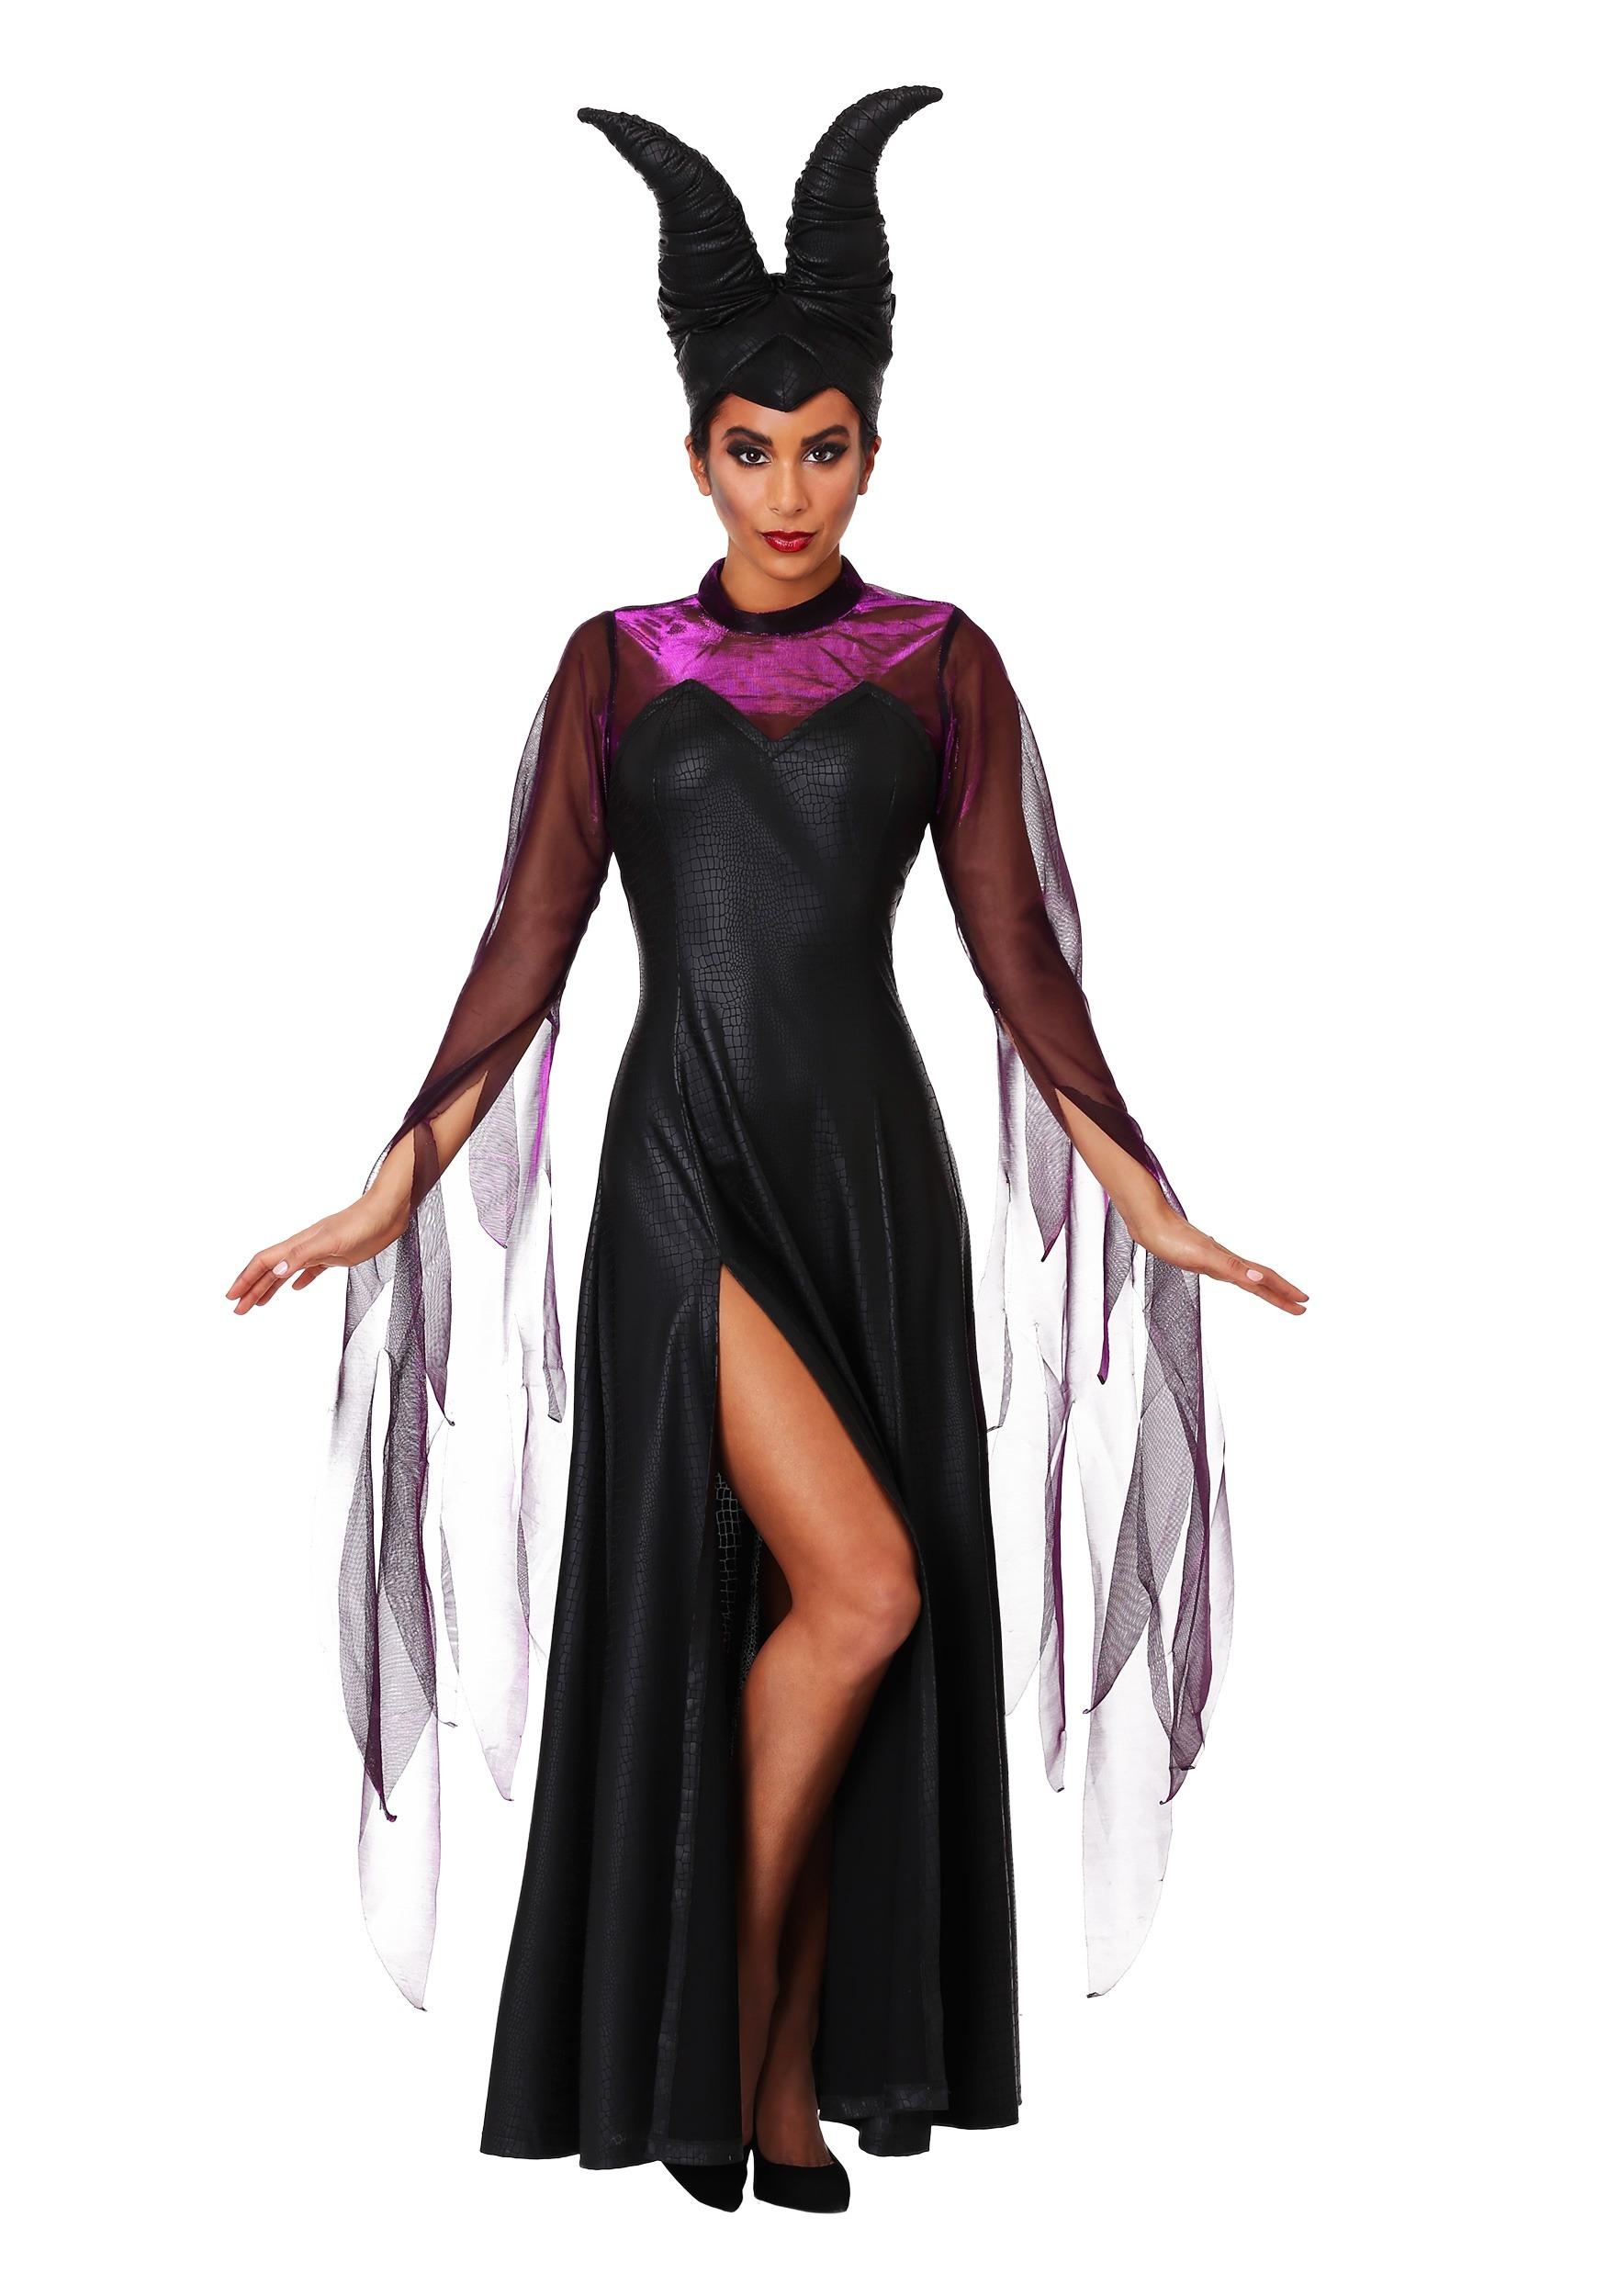 Malicious Queen Women's Costume